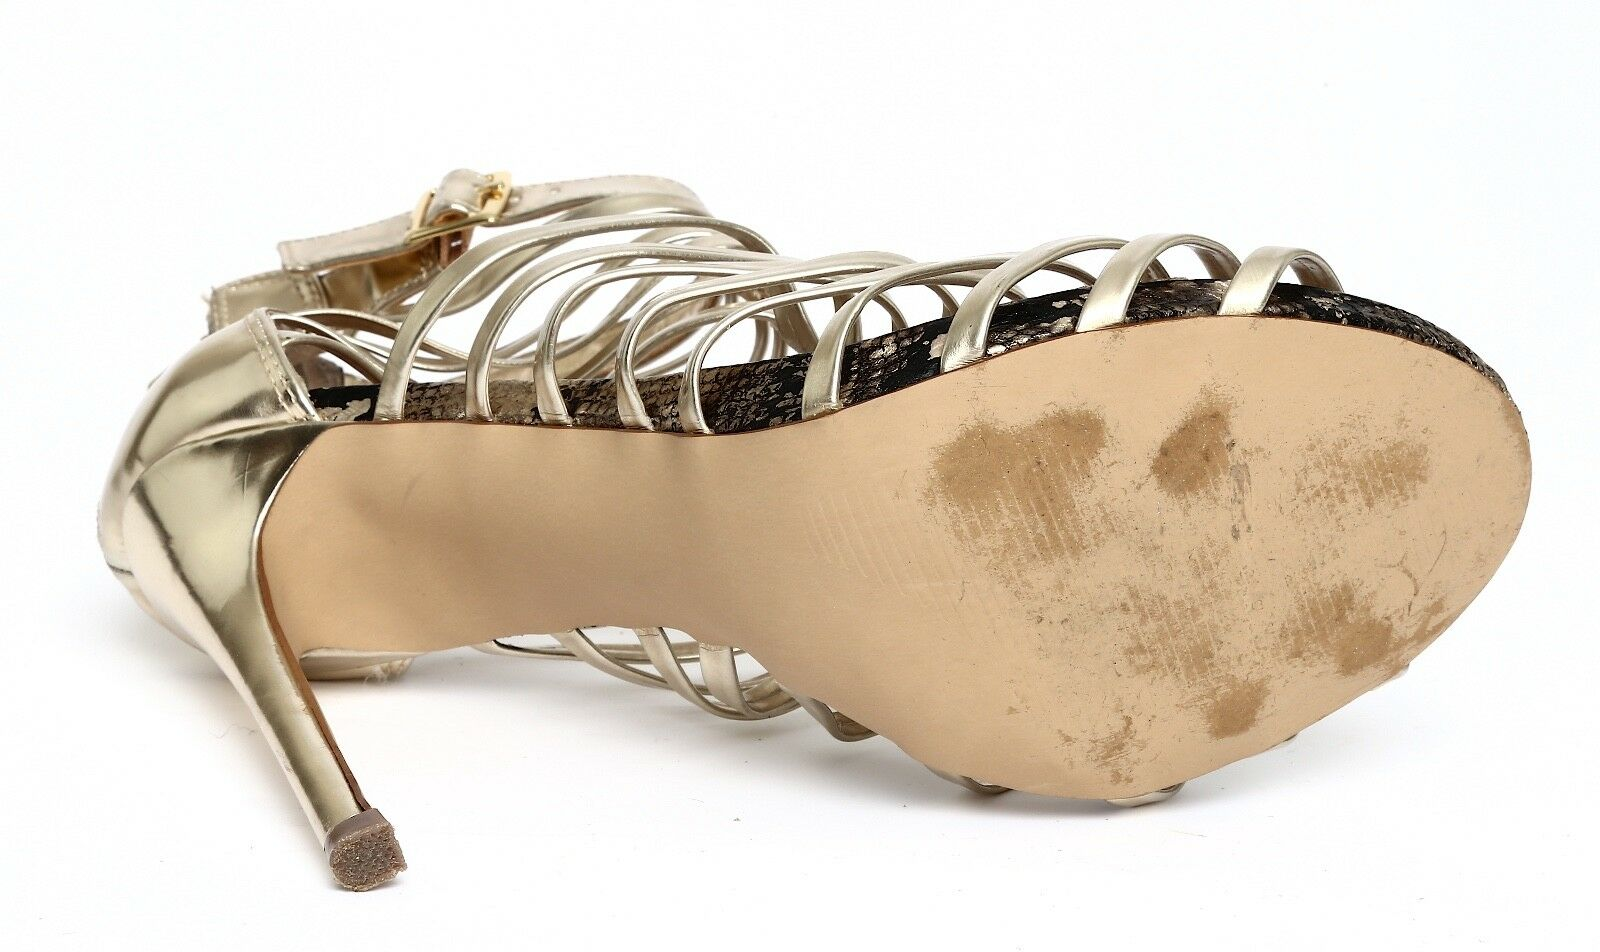 Steve Madden Marinee Gold Metallic damen Platform Sandal Heels Heels Heels Sz 7.5M 3268 4cf3f2